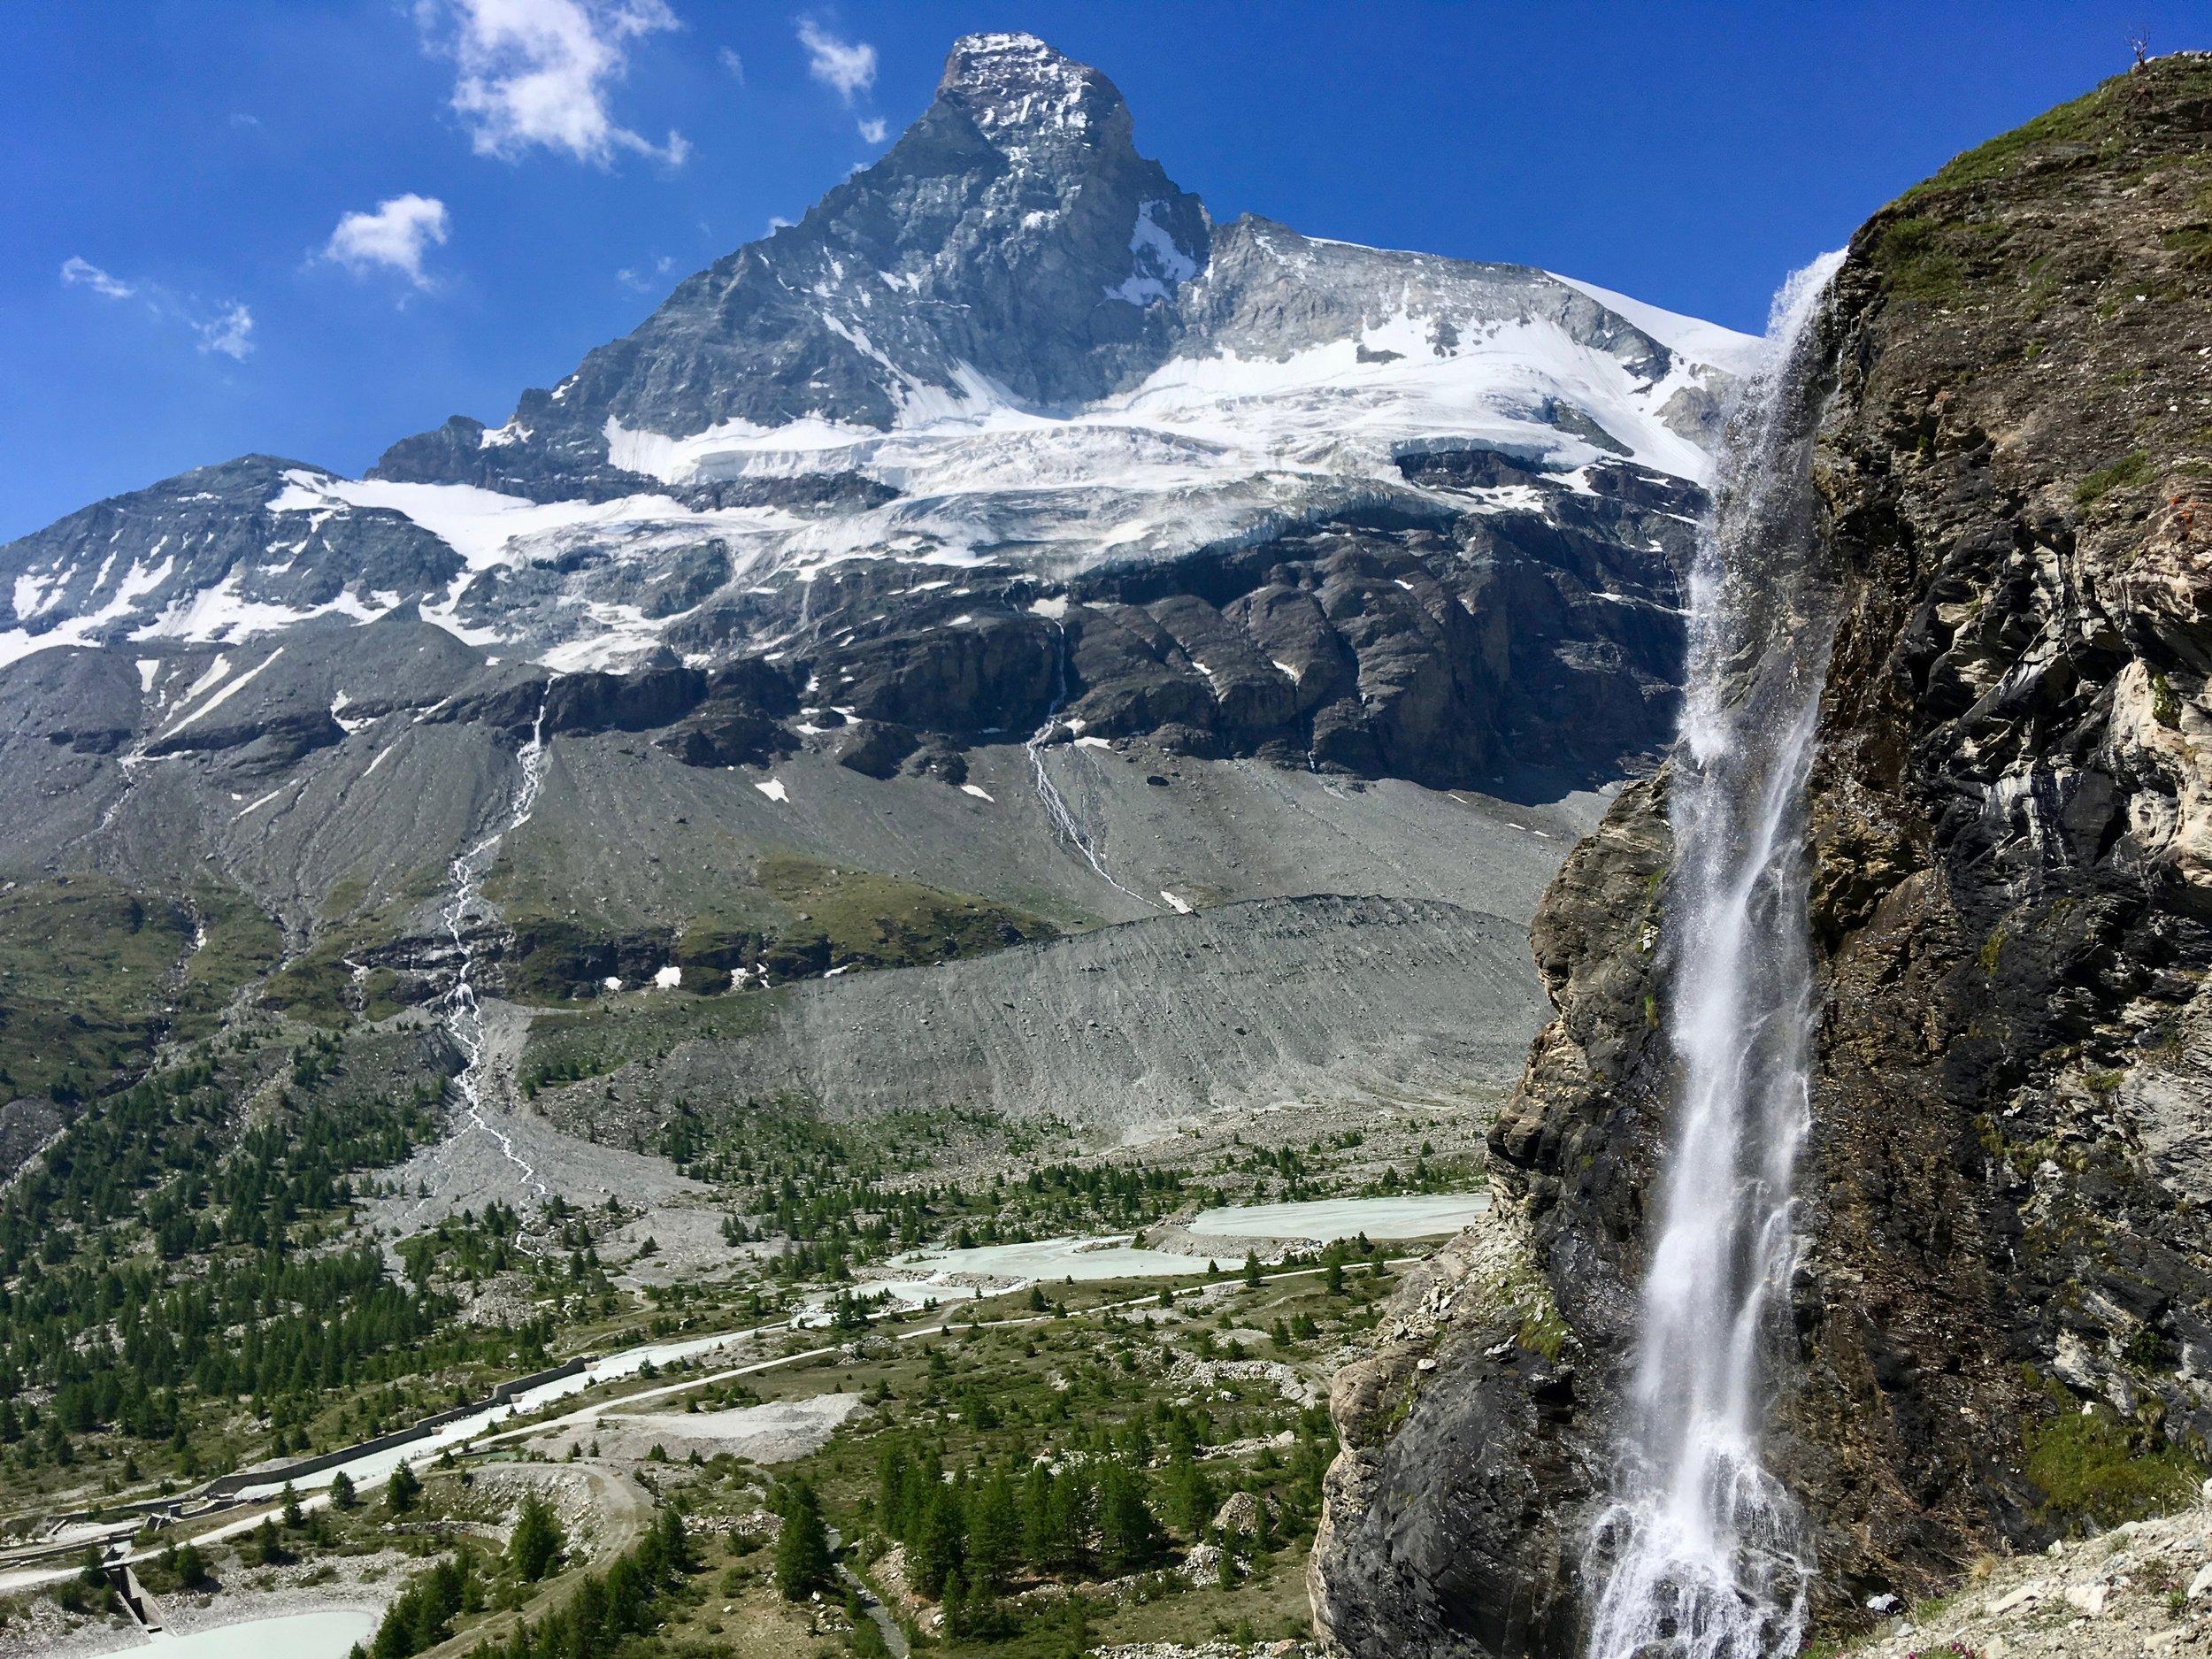 The Matterhorn - Zermatt, Switzerland